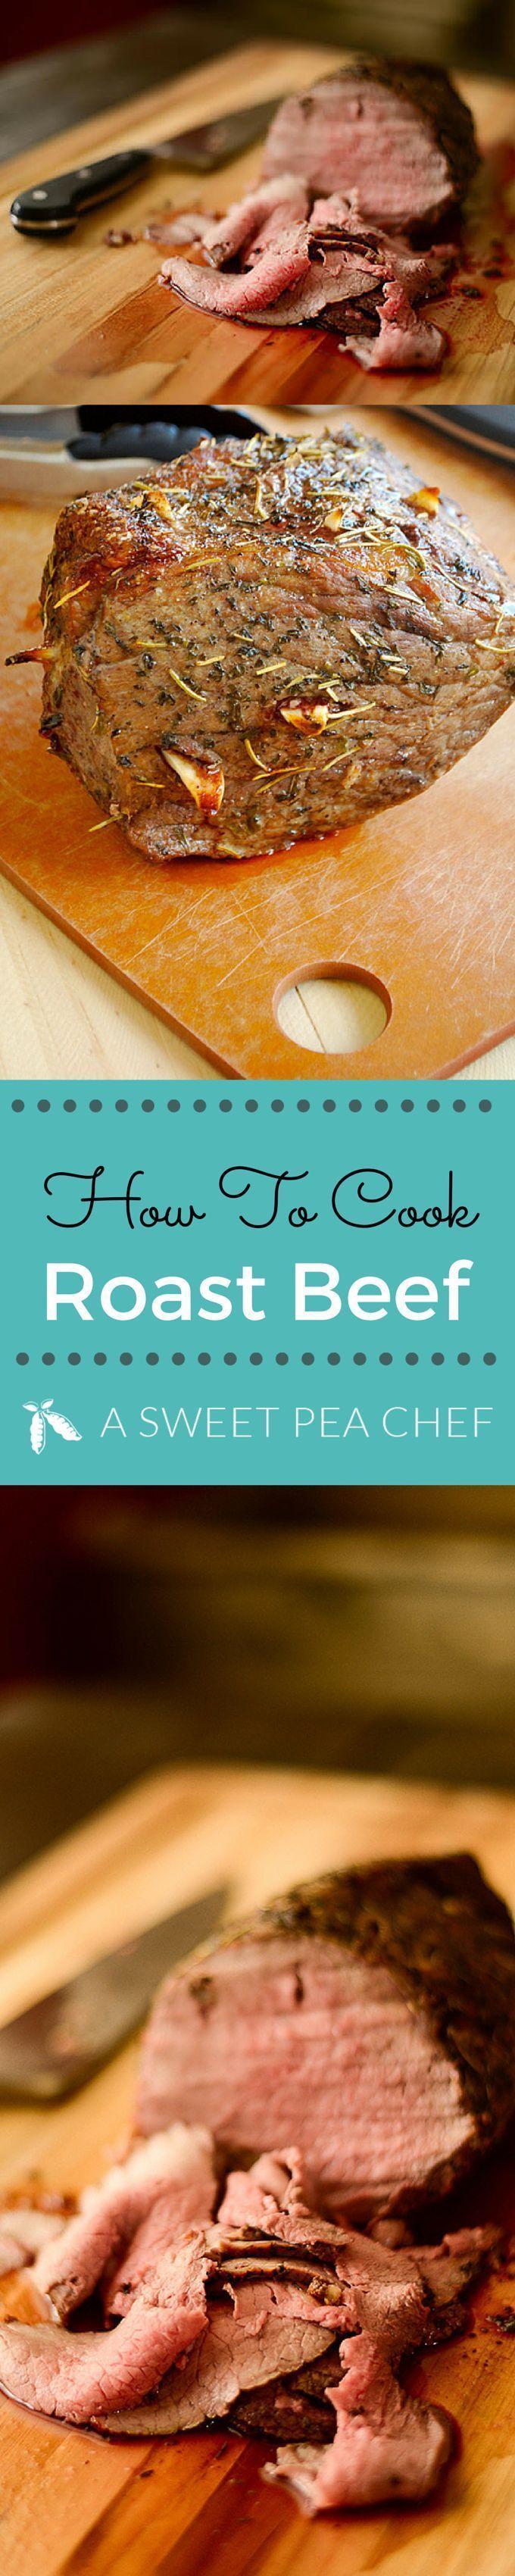 How to Cook Roast Beef #sunday #dinner #roastbeef #asweetpeachef Lacey Baier http://www.asweetpeachef.com